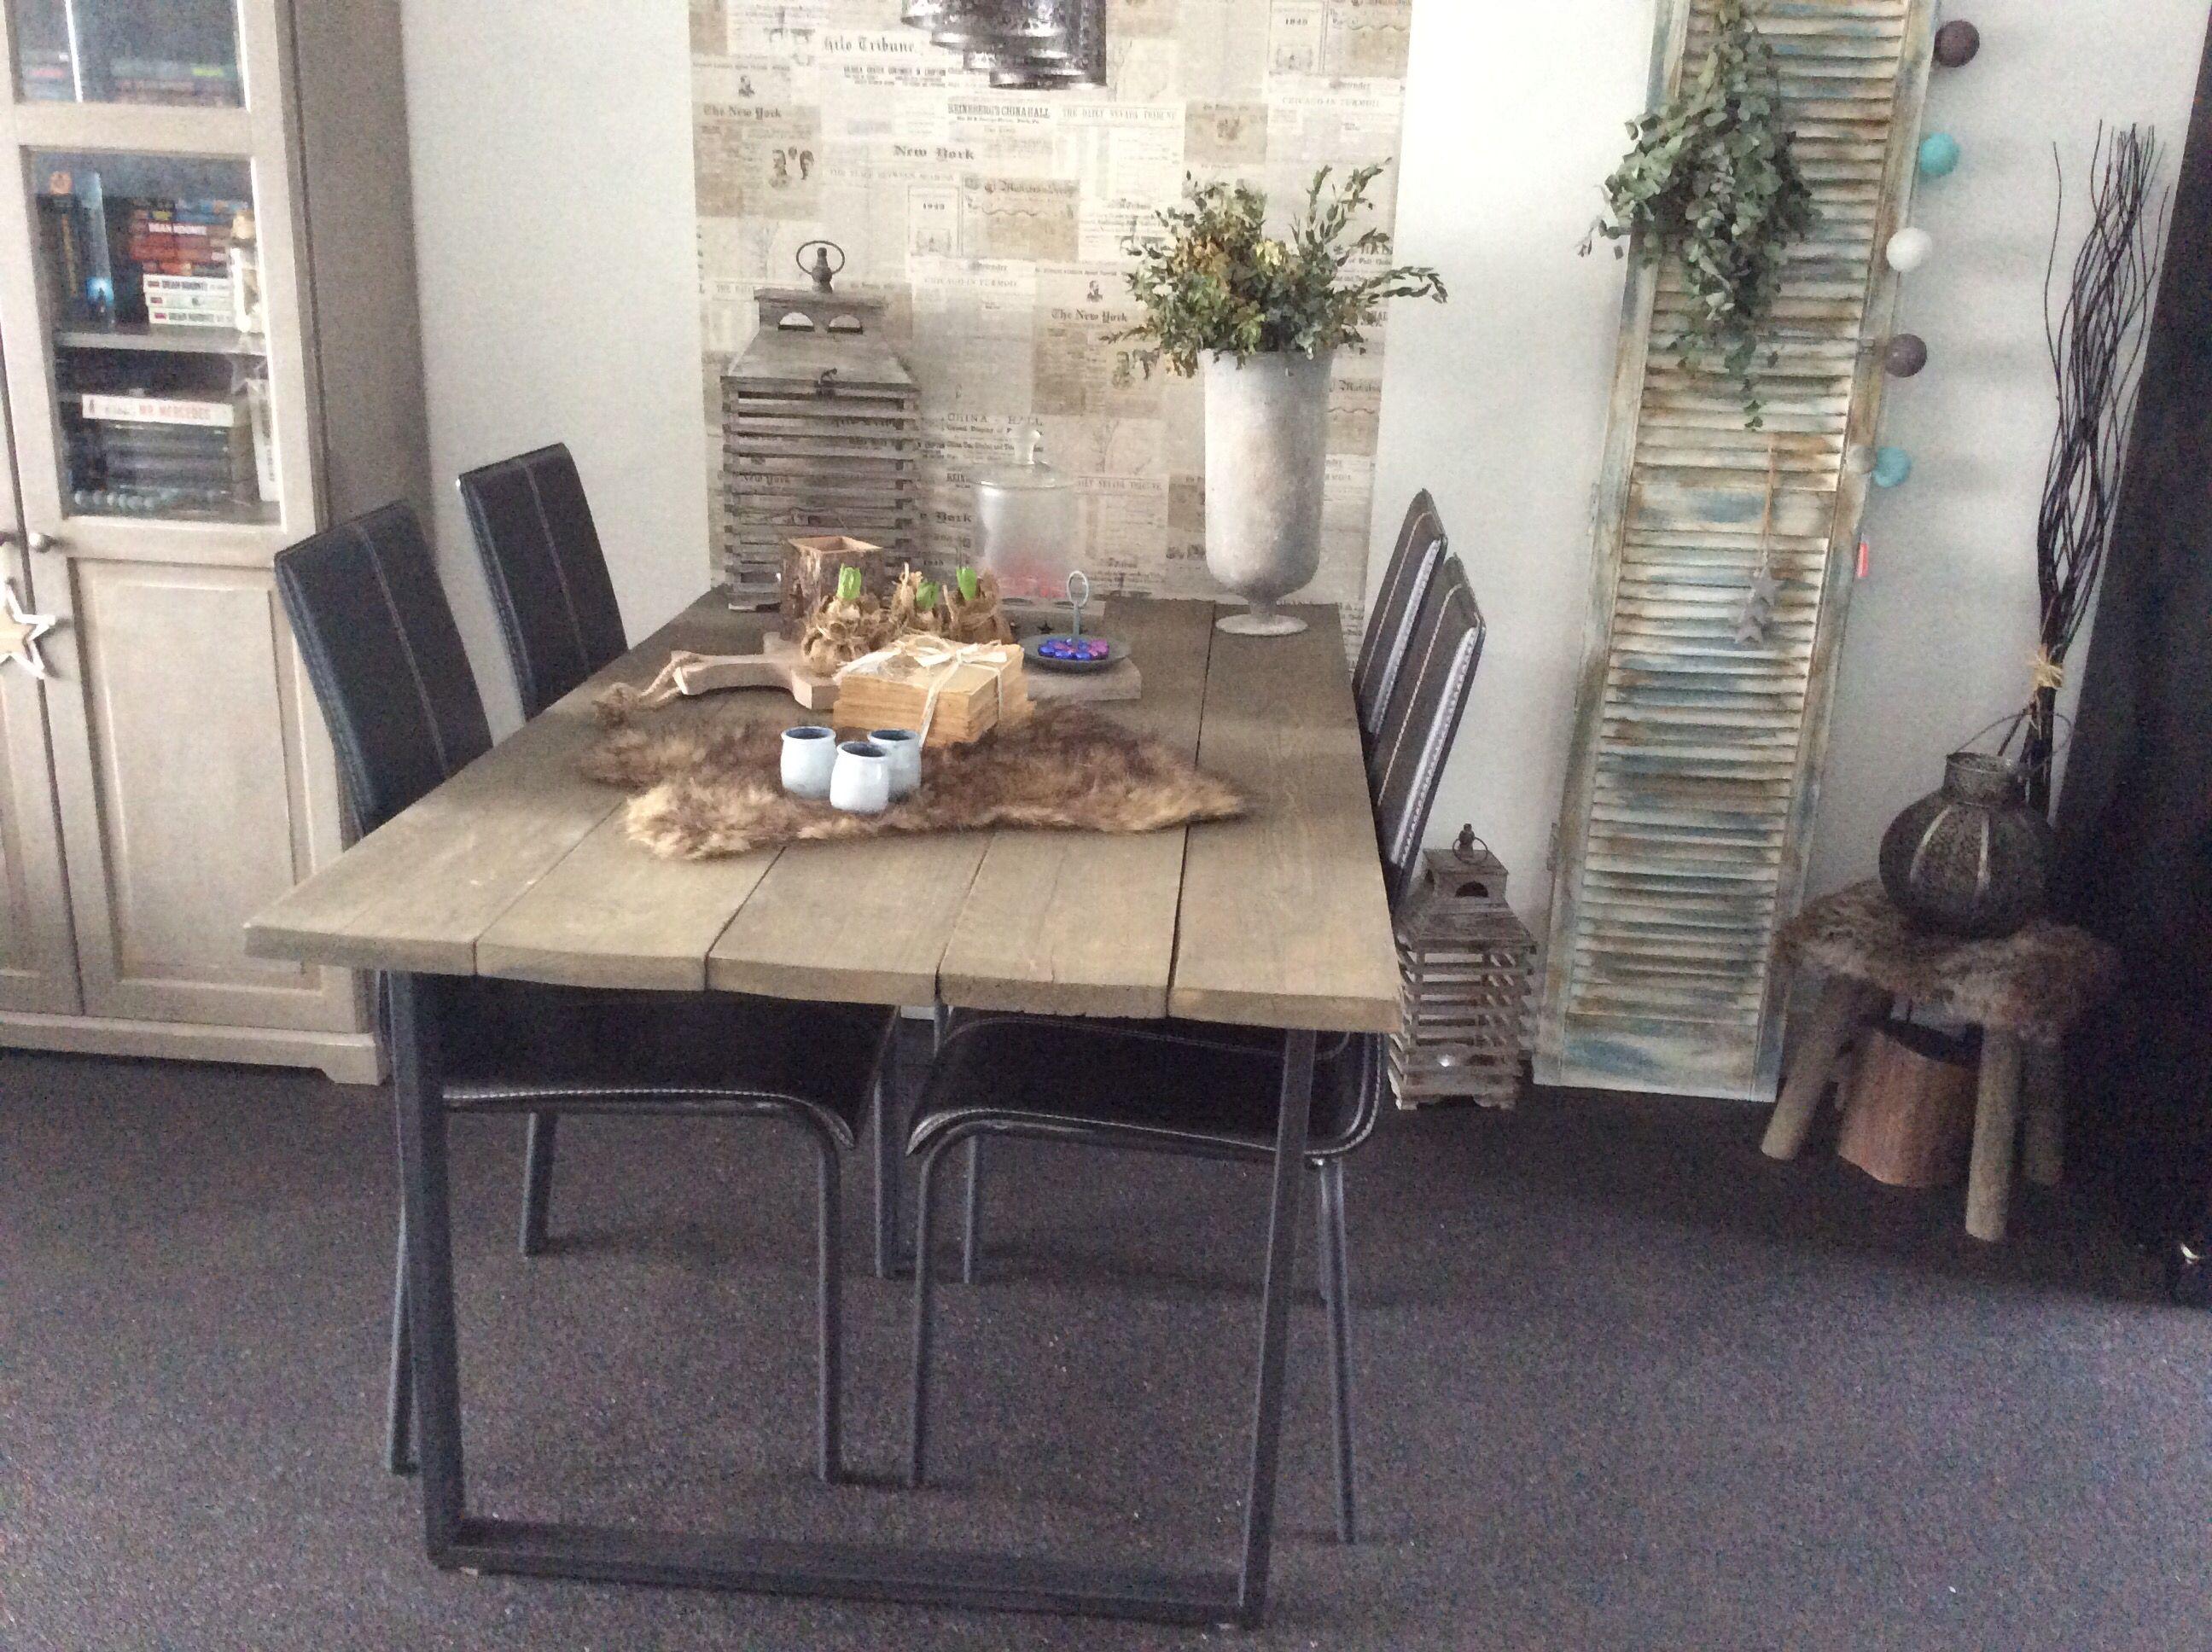 Nice onderstel tafel ikea fotos van tafel decor tafel ideeën